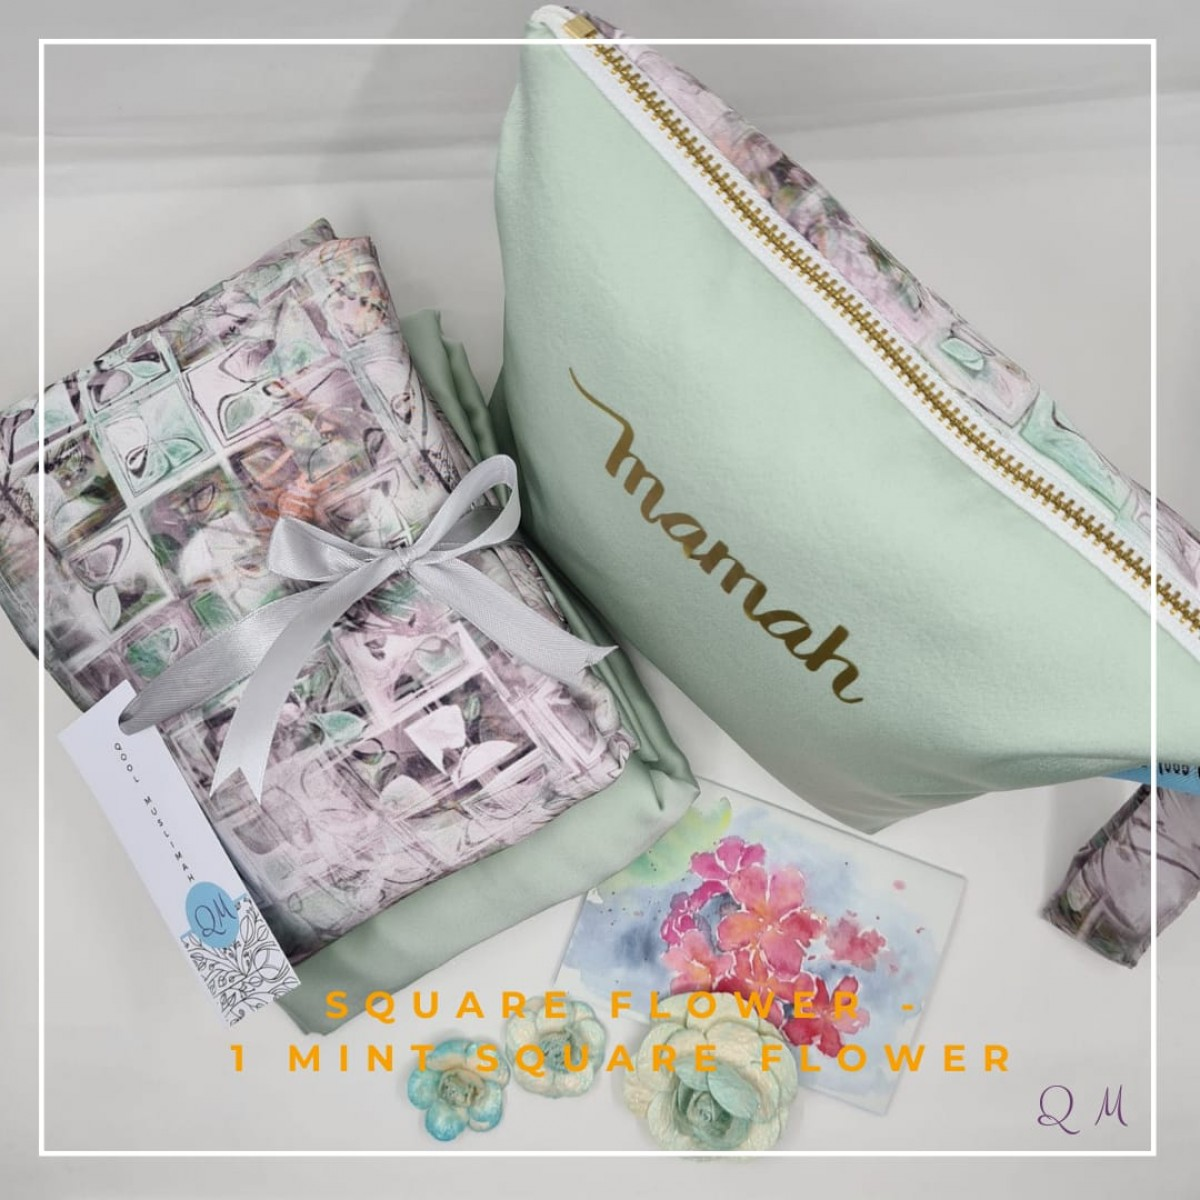 P7.Telekung/Mukena Armani Silk Square Floral - Mint Square Floral - Qool Muslimah